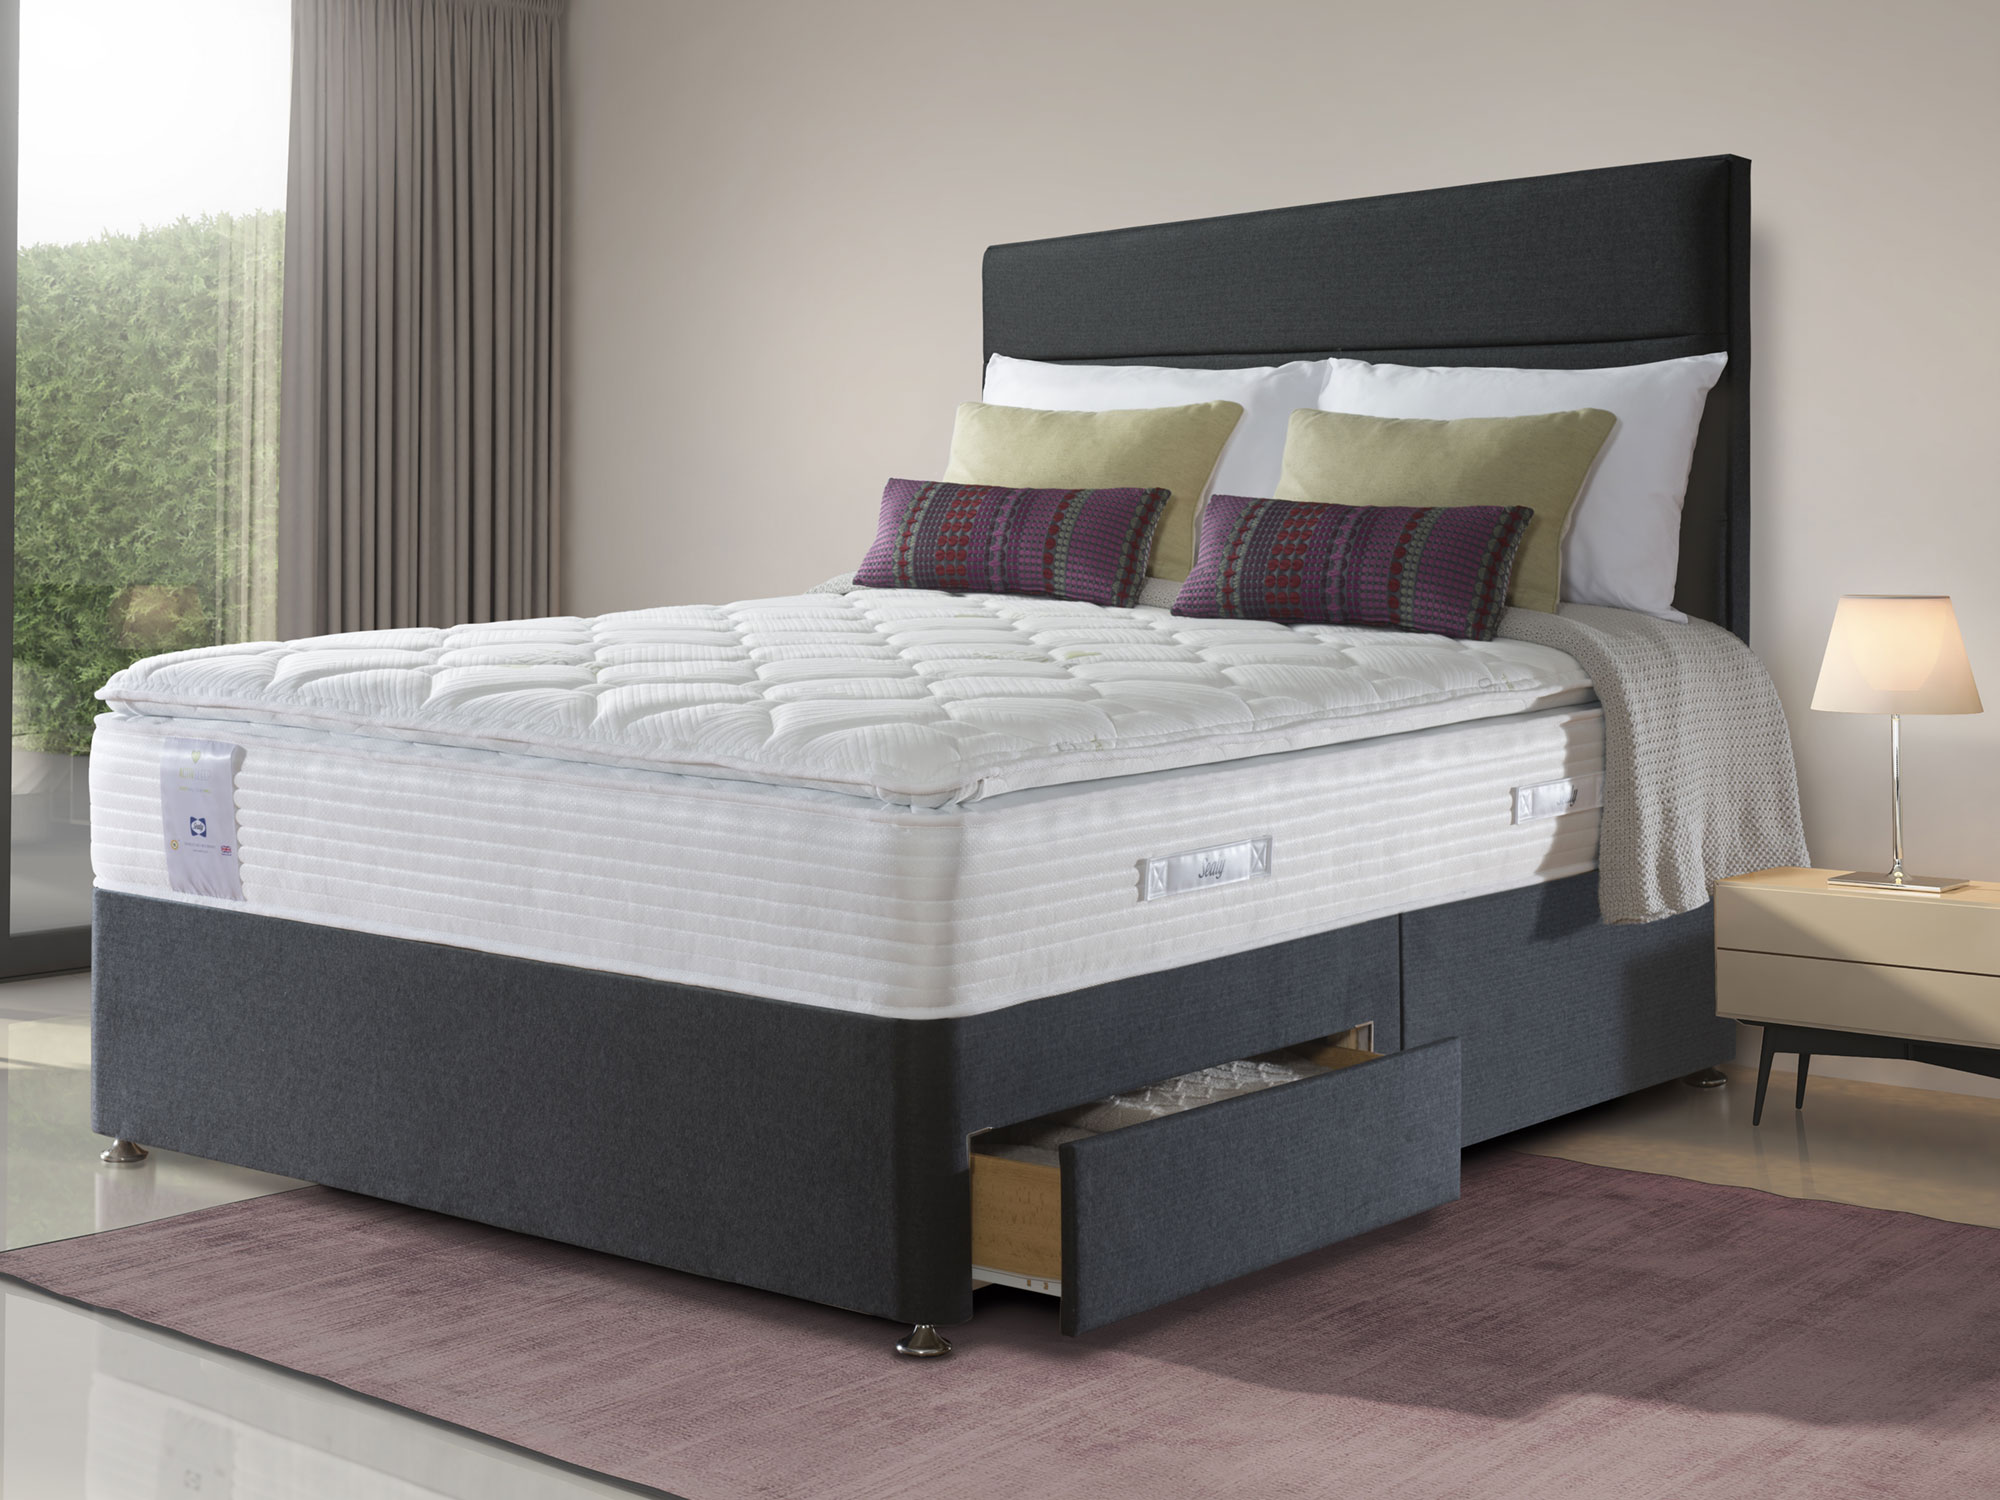 The Sleep Shop 5ft King Size Sealy ActivSleep Geltex ...